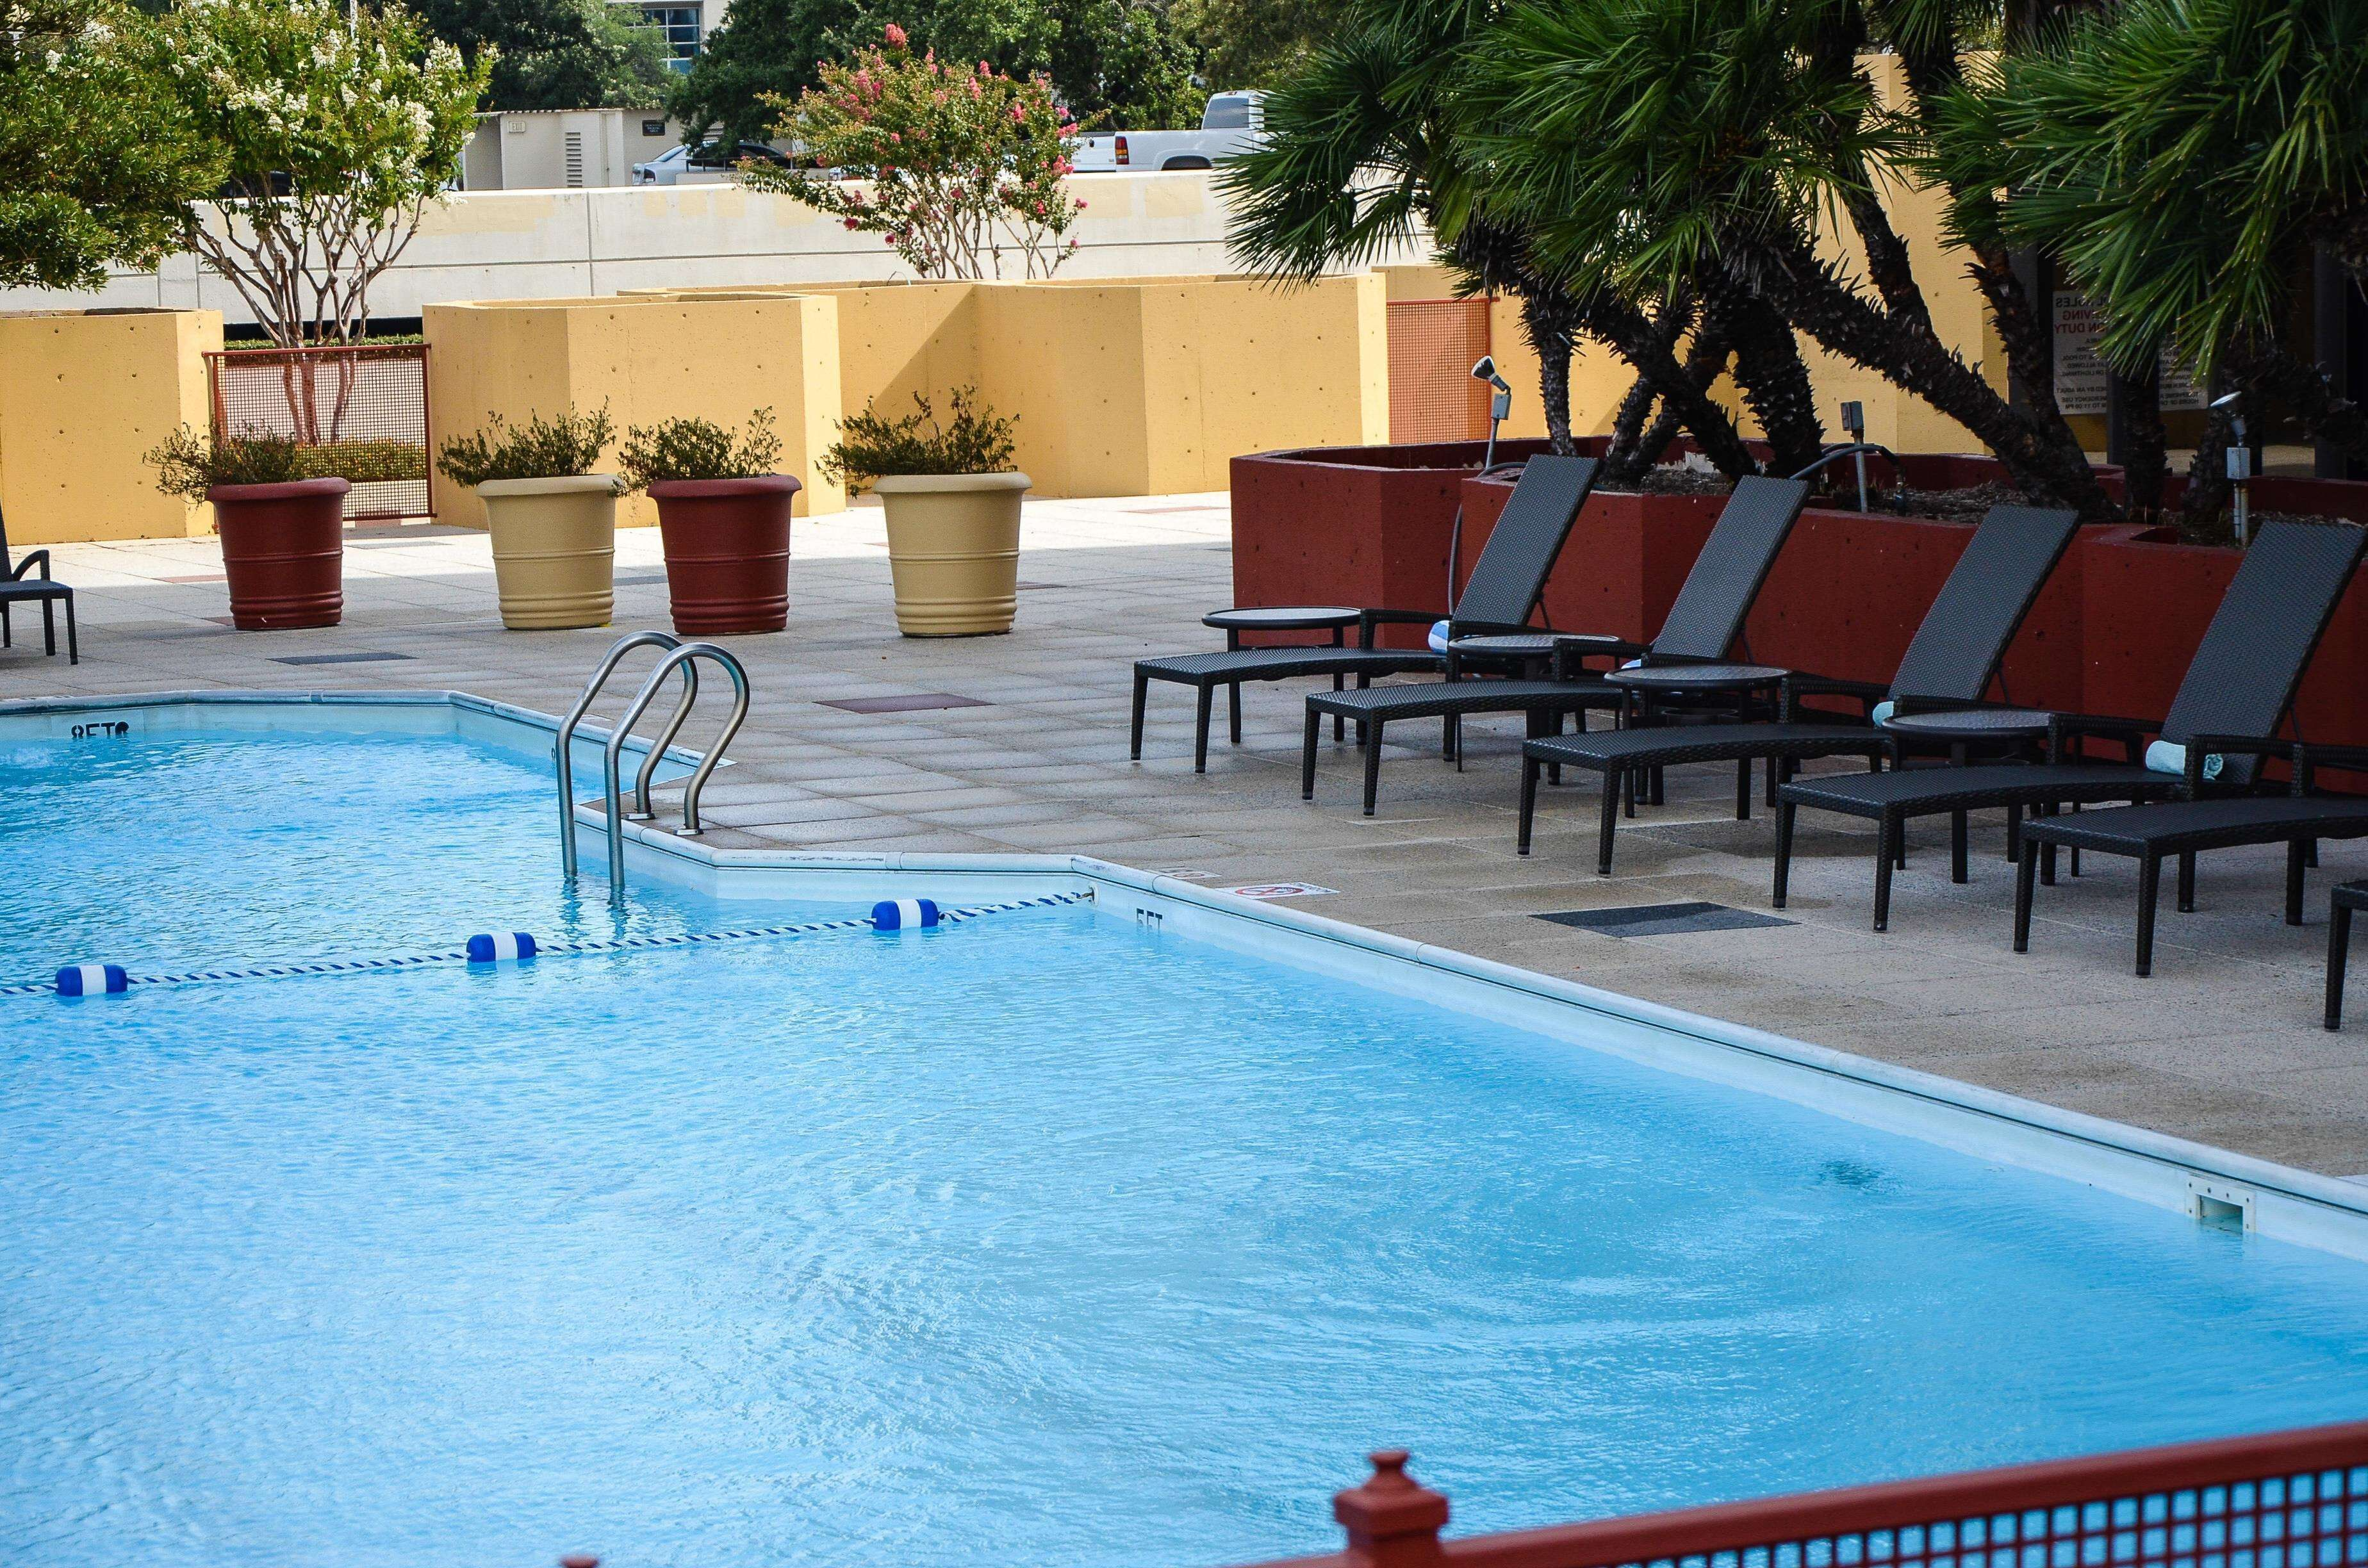 Courtesy of DoubleTree by Hilton Hotel Houston – Greenway Plaza / Expedia.com